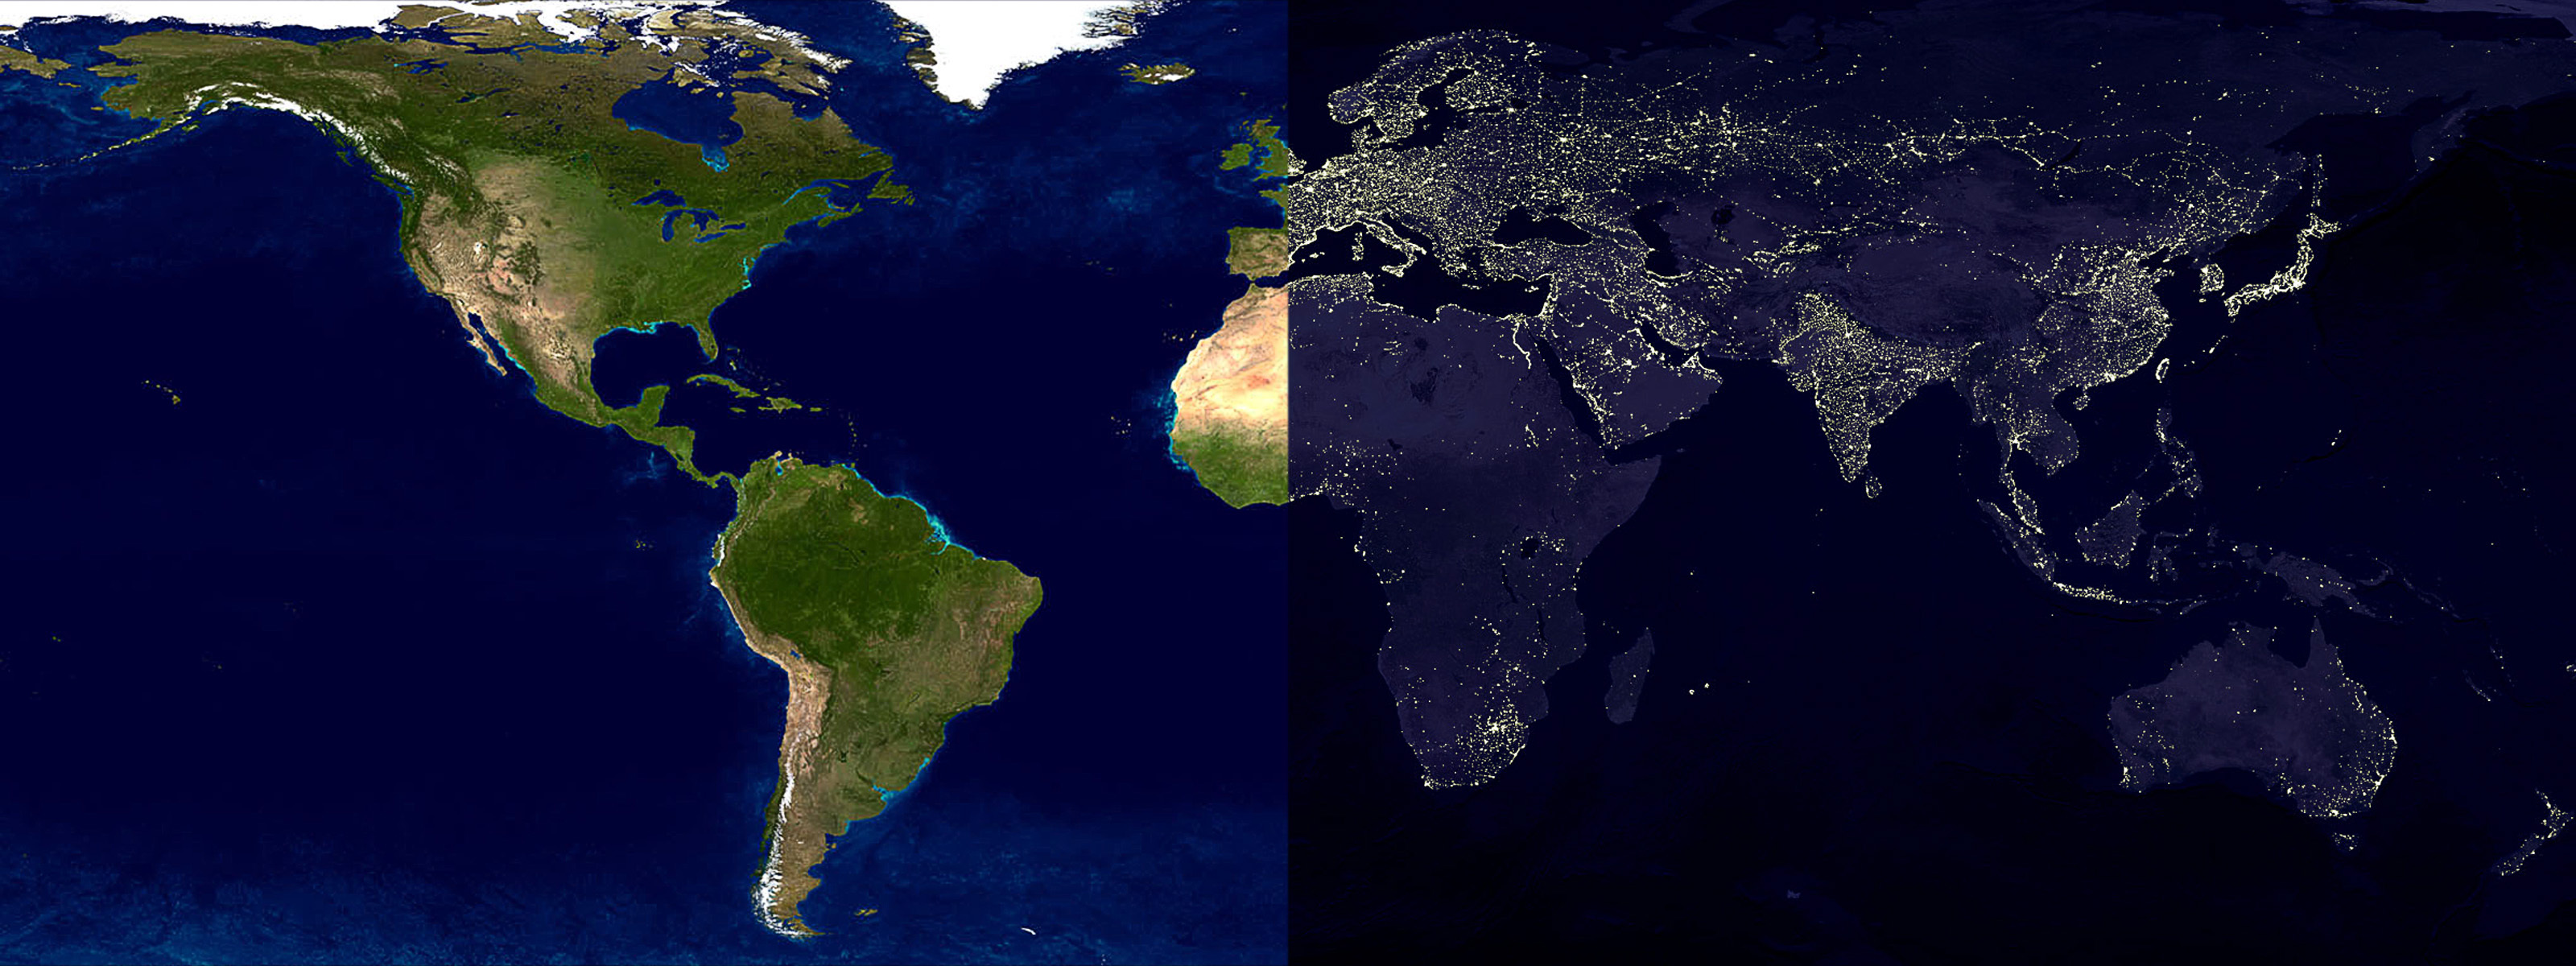 Day And Night World Map Desktop | autobedrijfmaatje